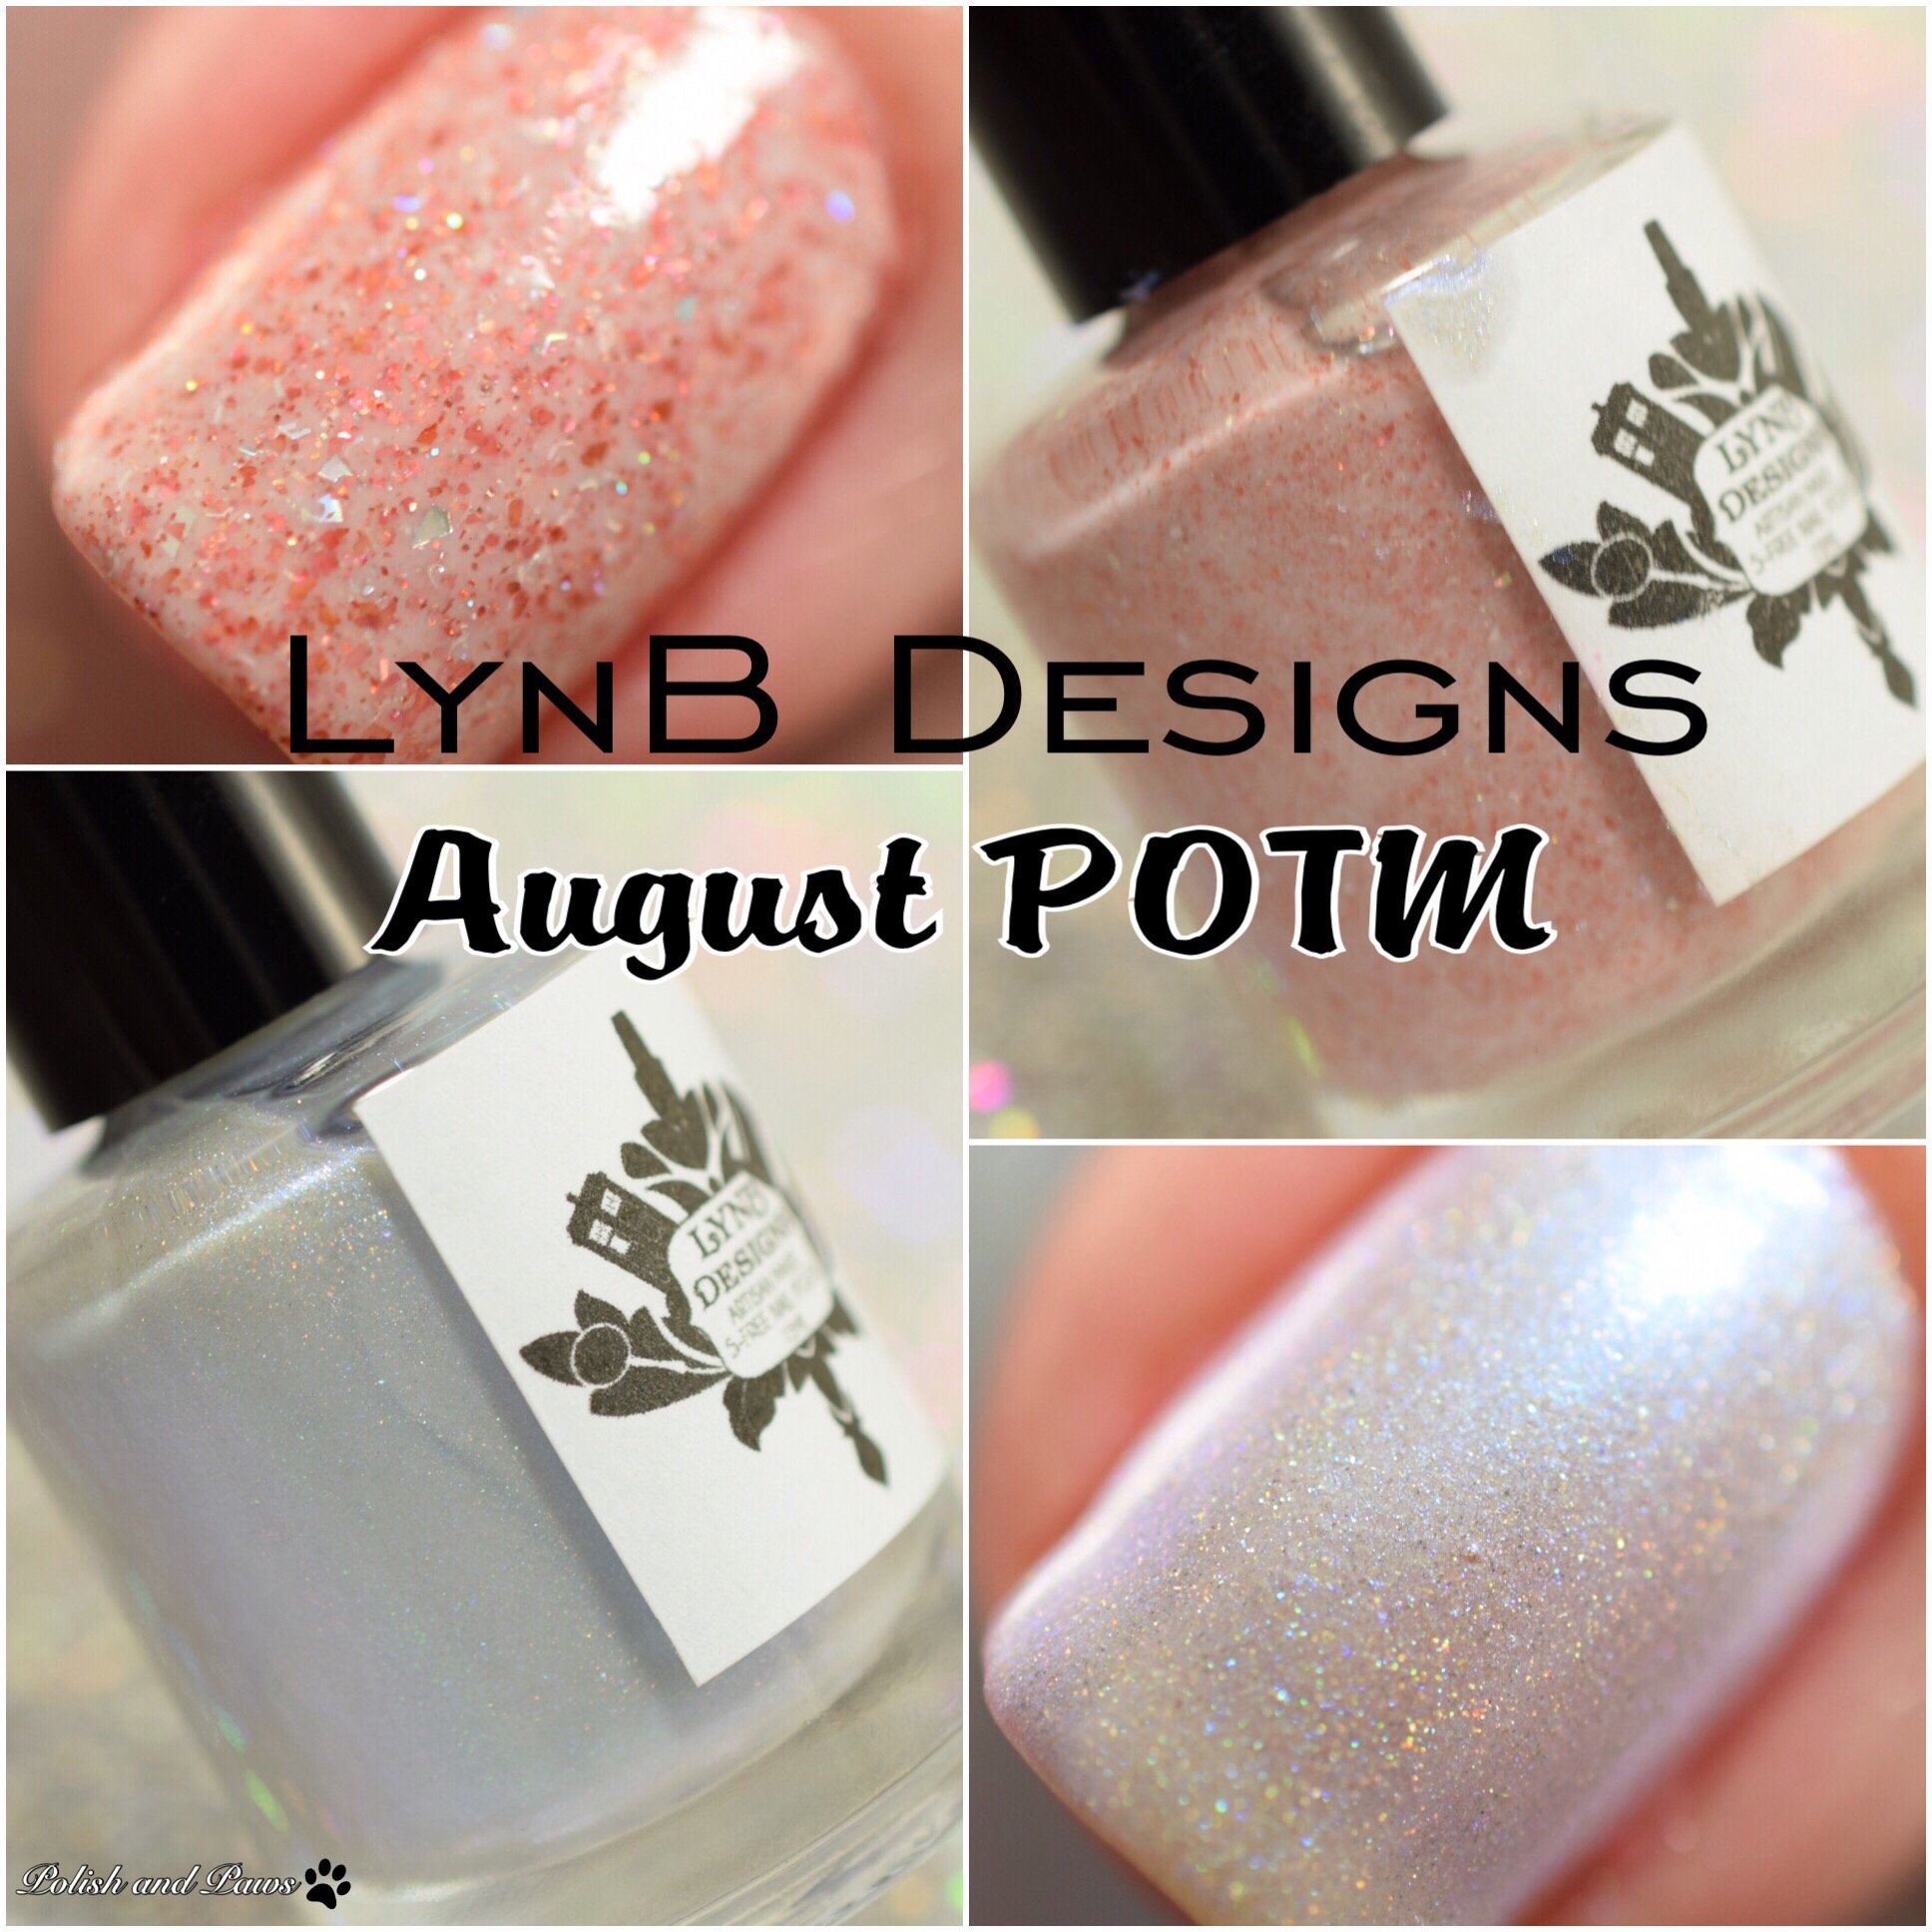 LynB Designs August POTM